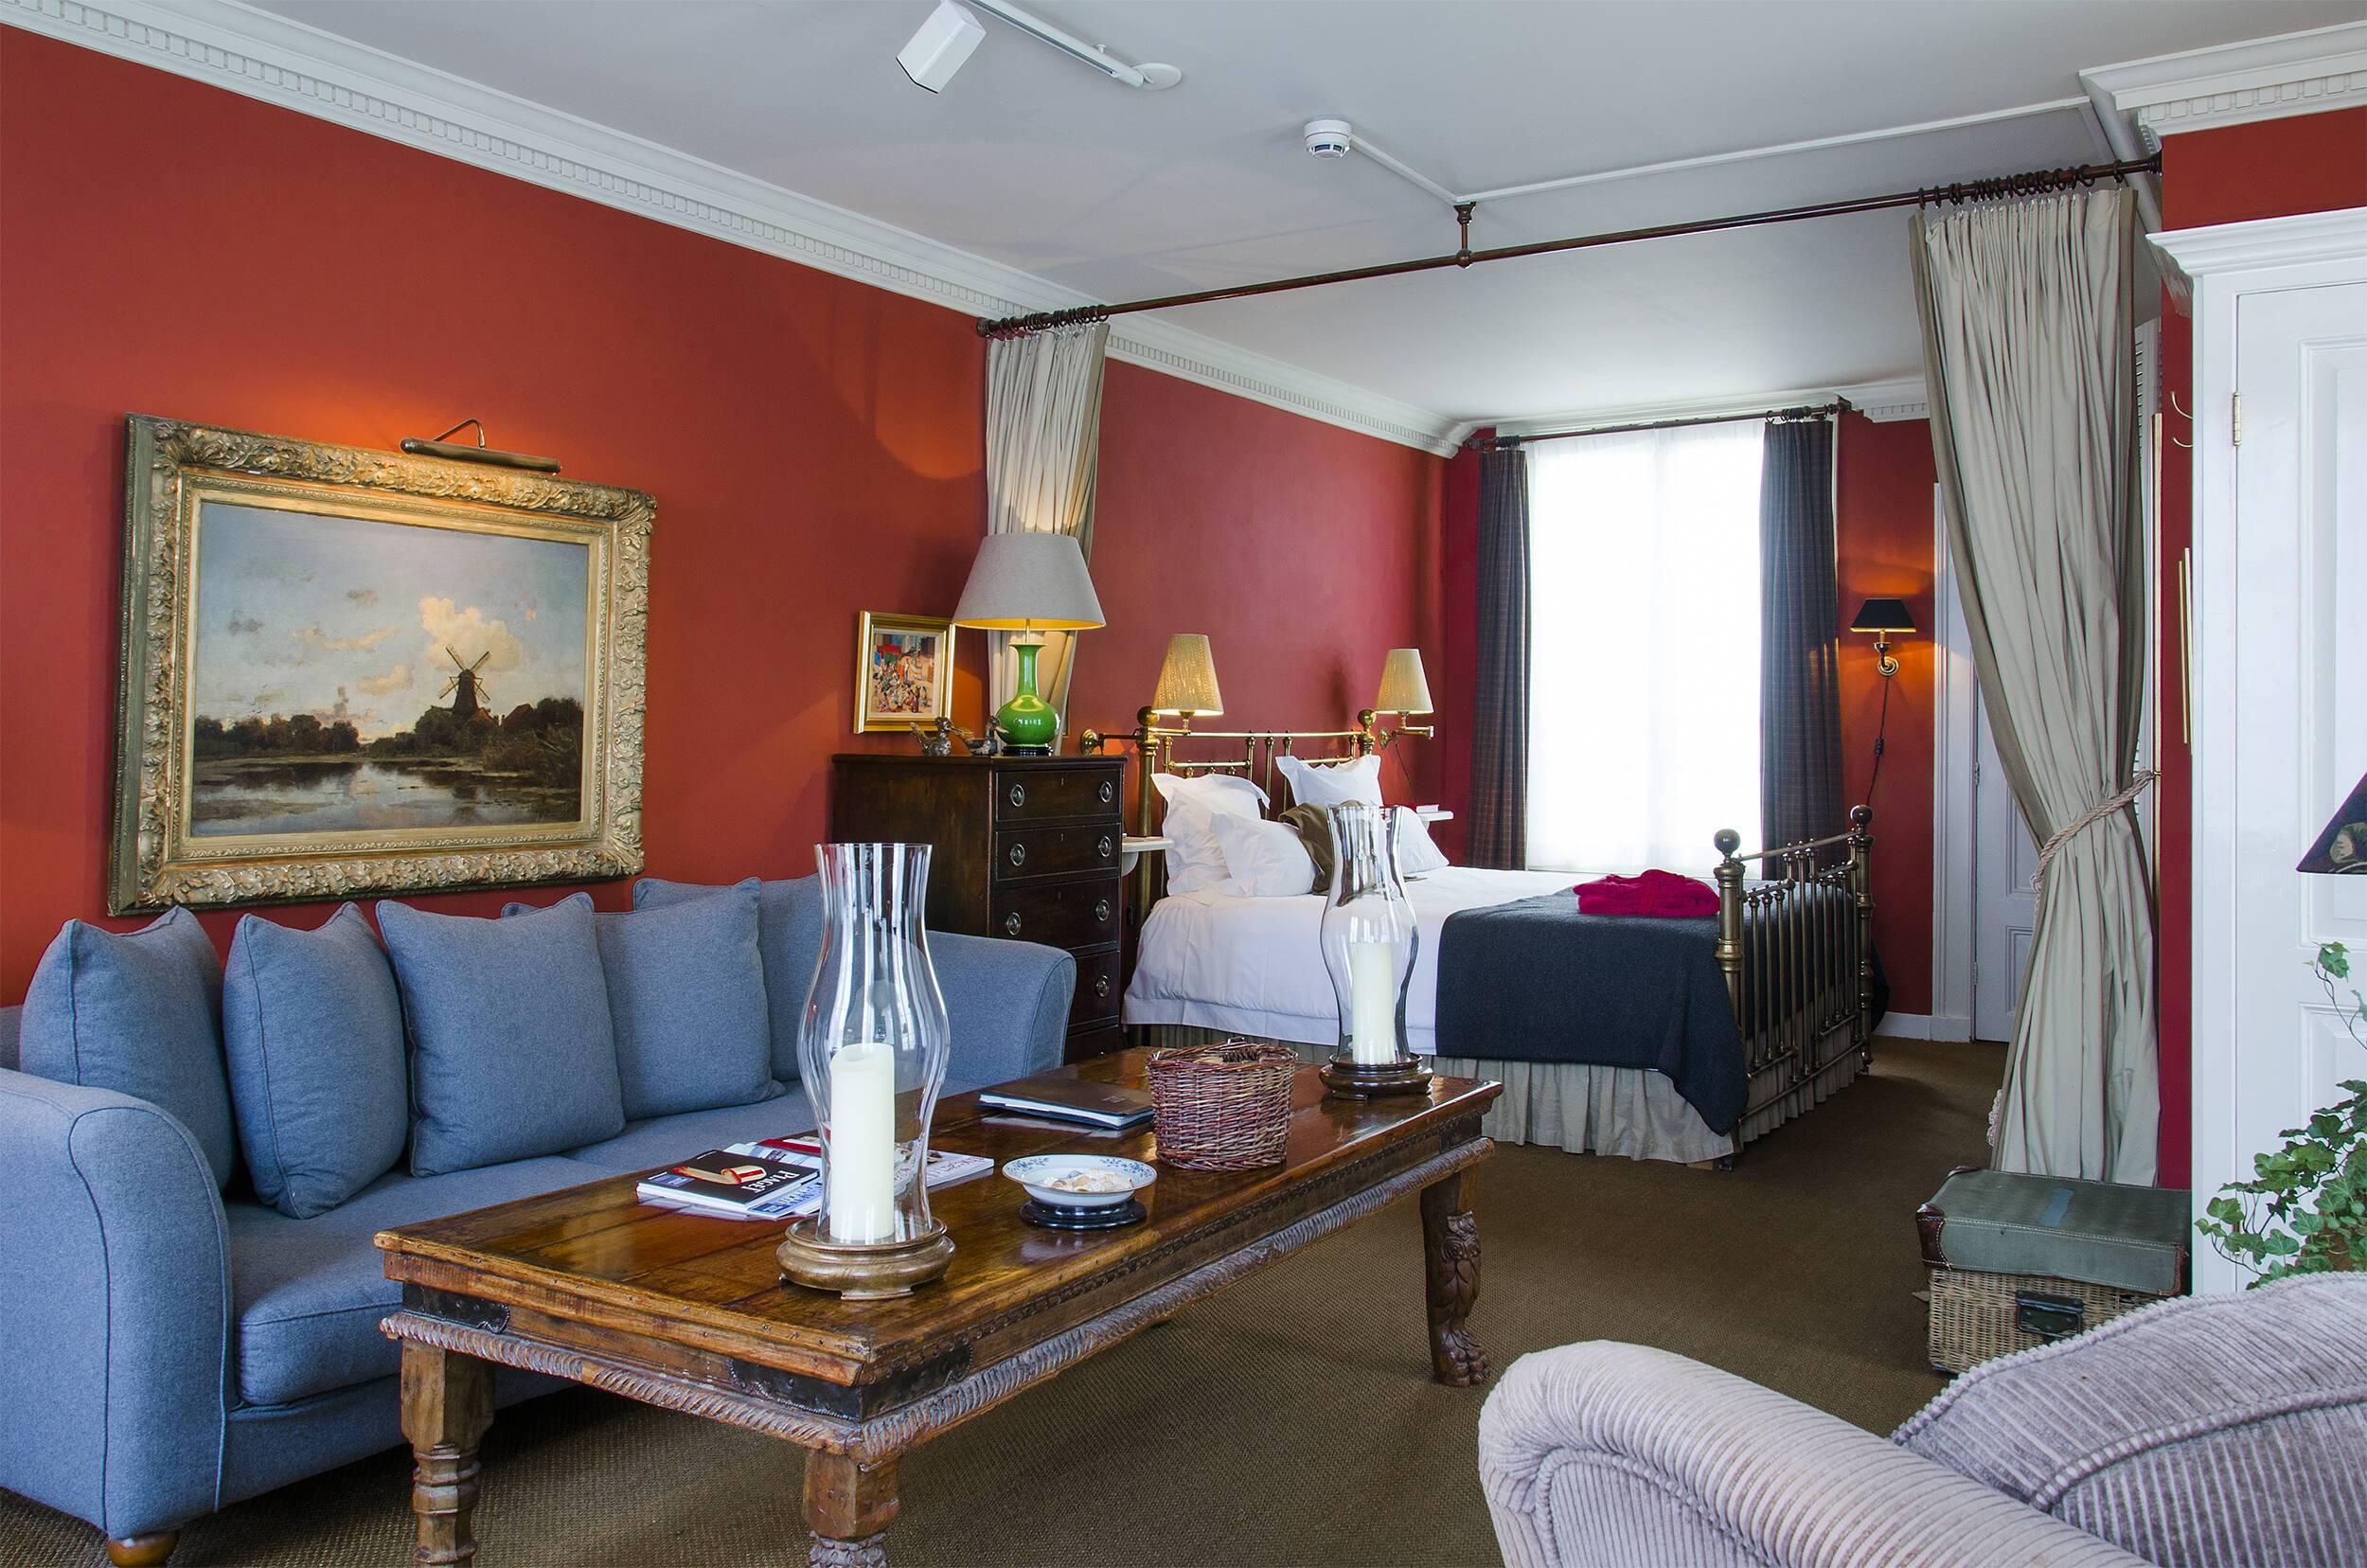 717 hotel junior suite tolkien amsterdam